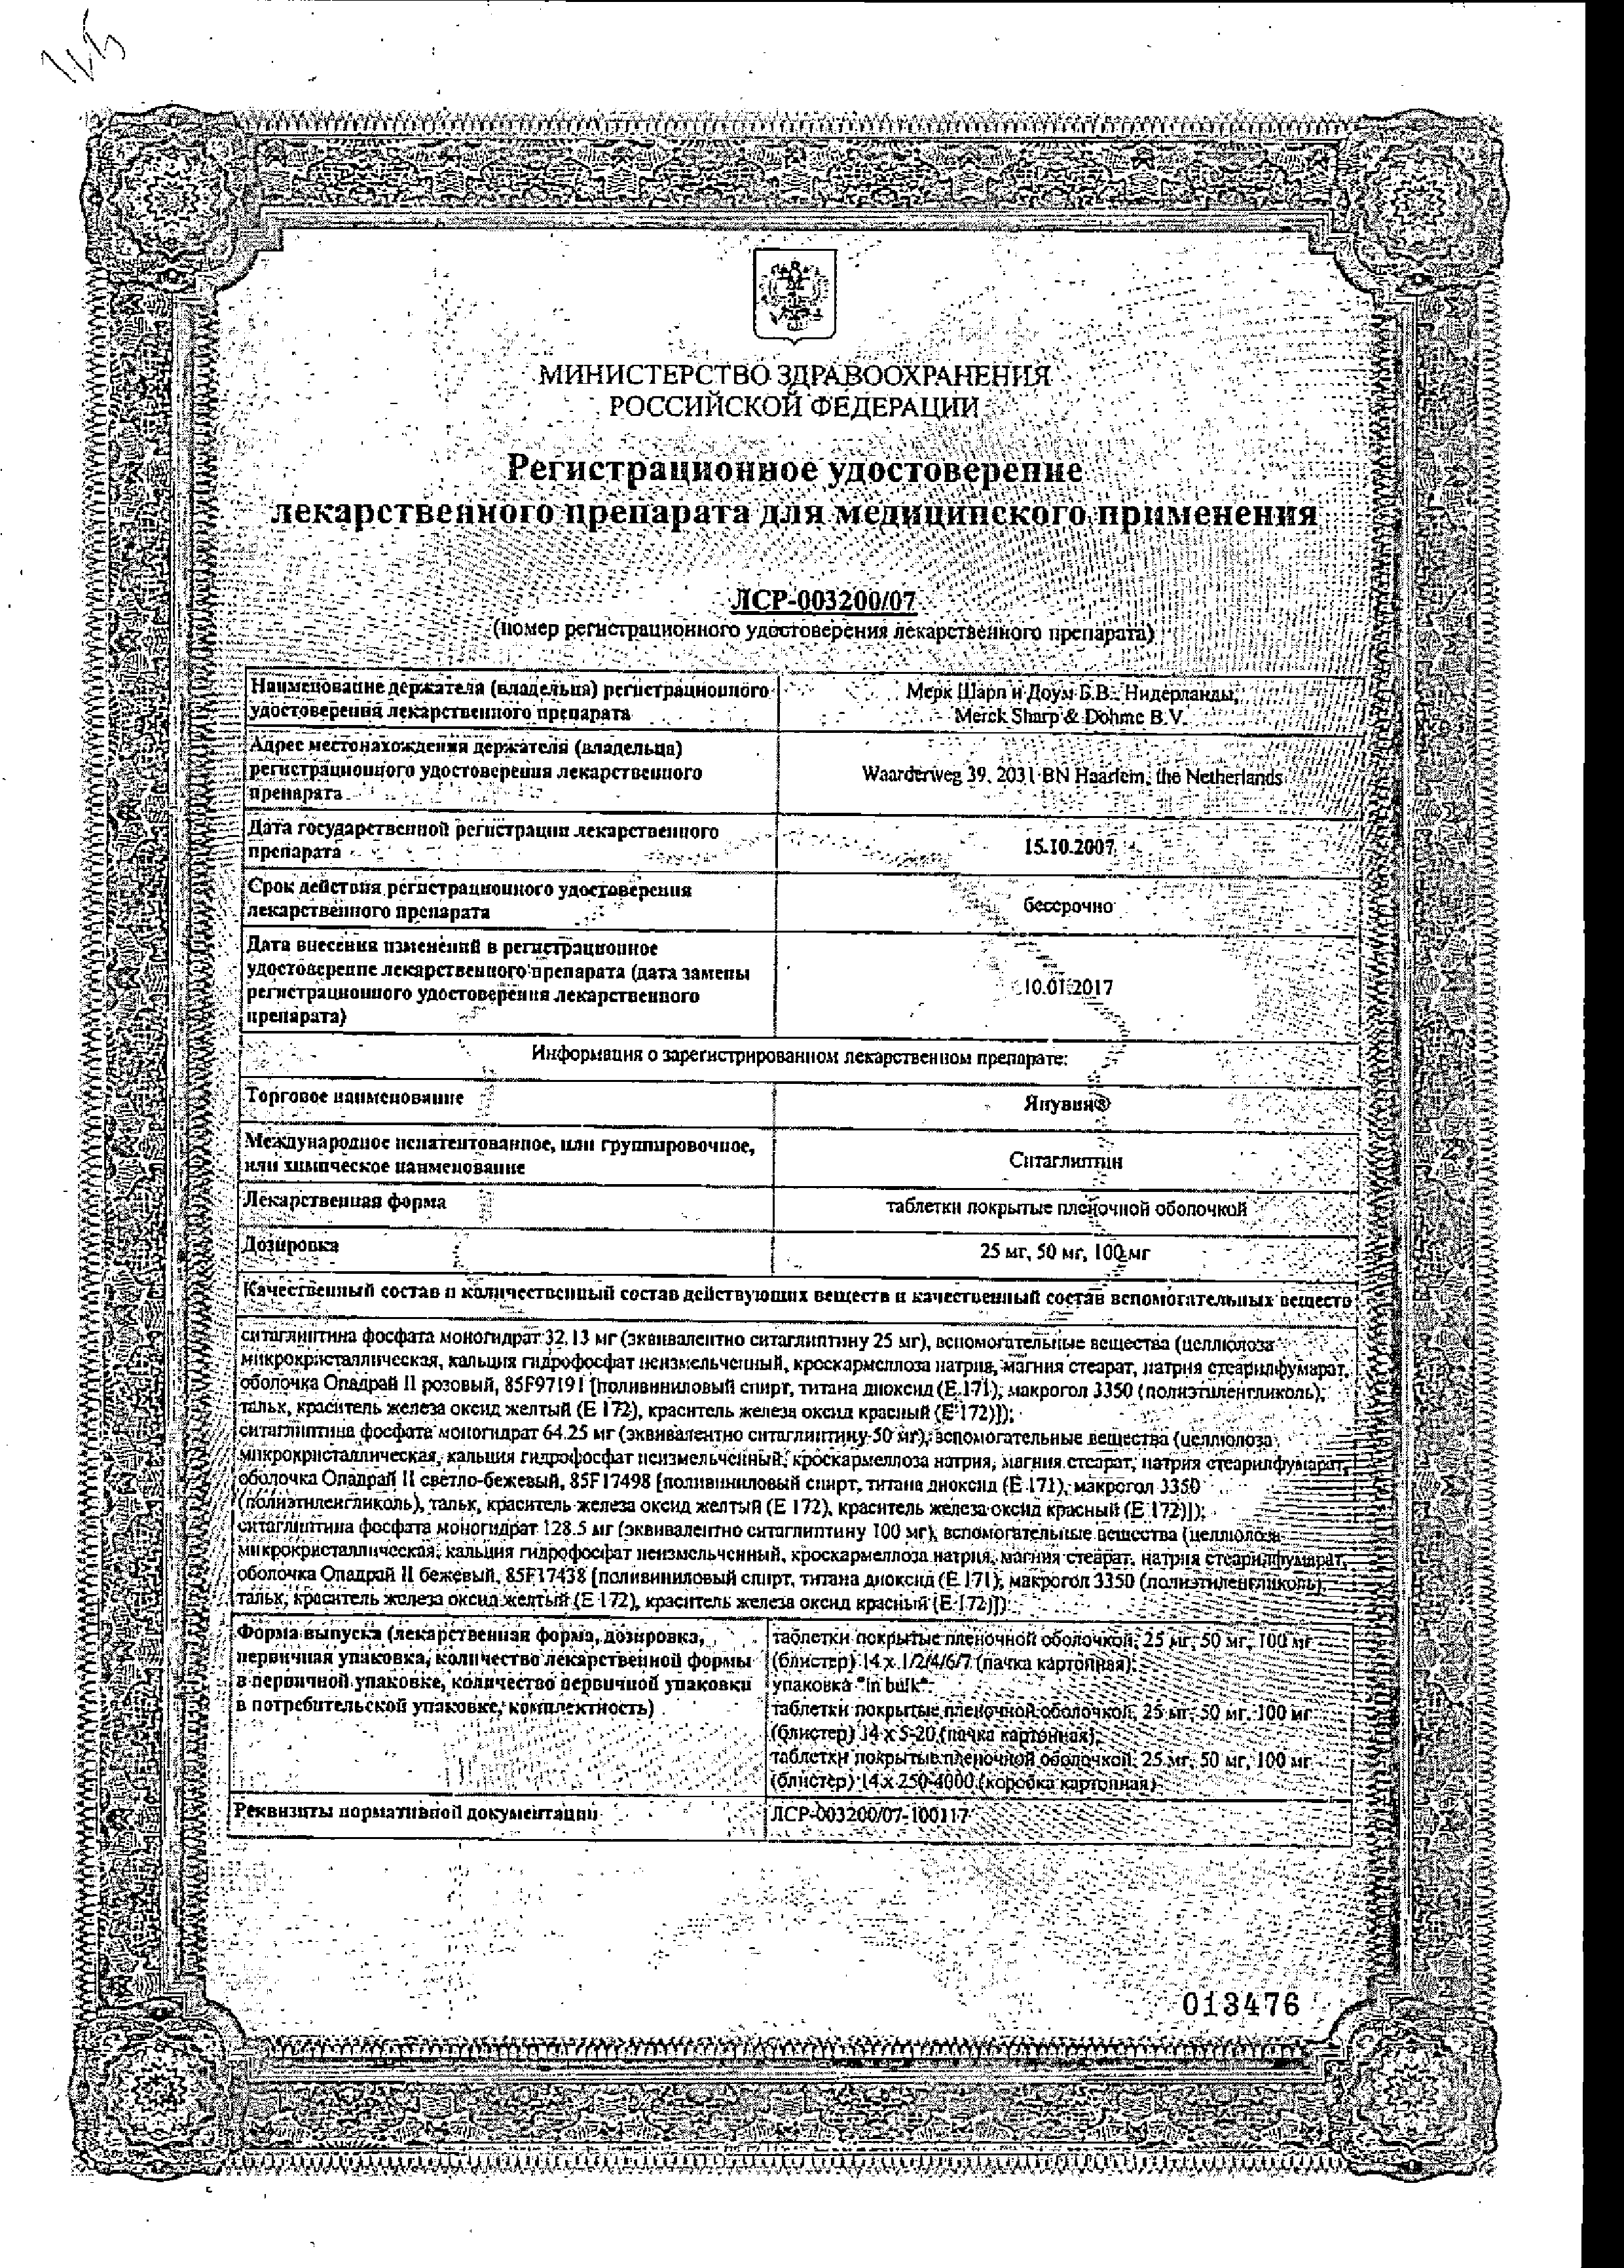 Янувия сертификат